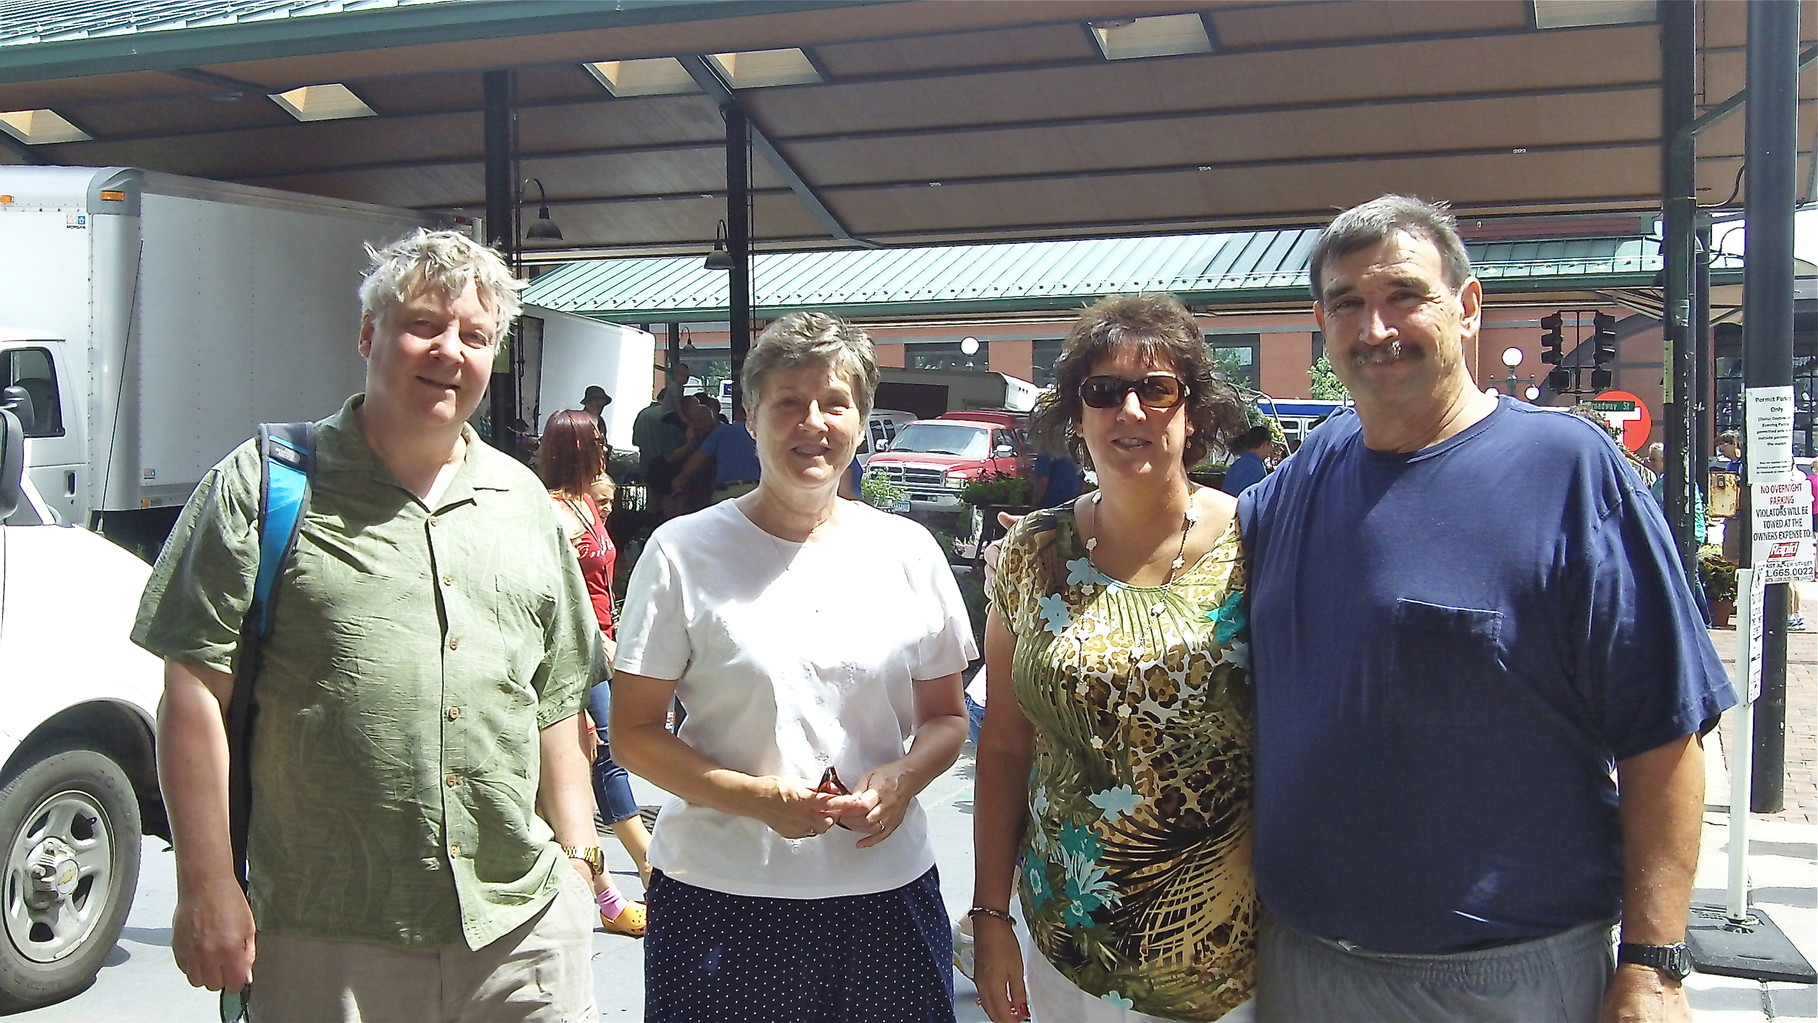 John Ackerman, Cindy Wagner, Jill & Paul Wagner, Farmer's Market